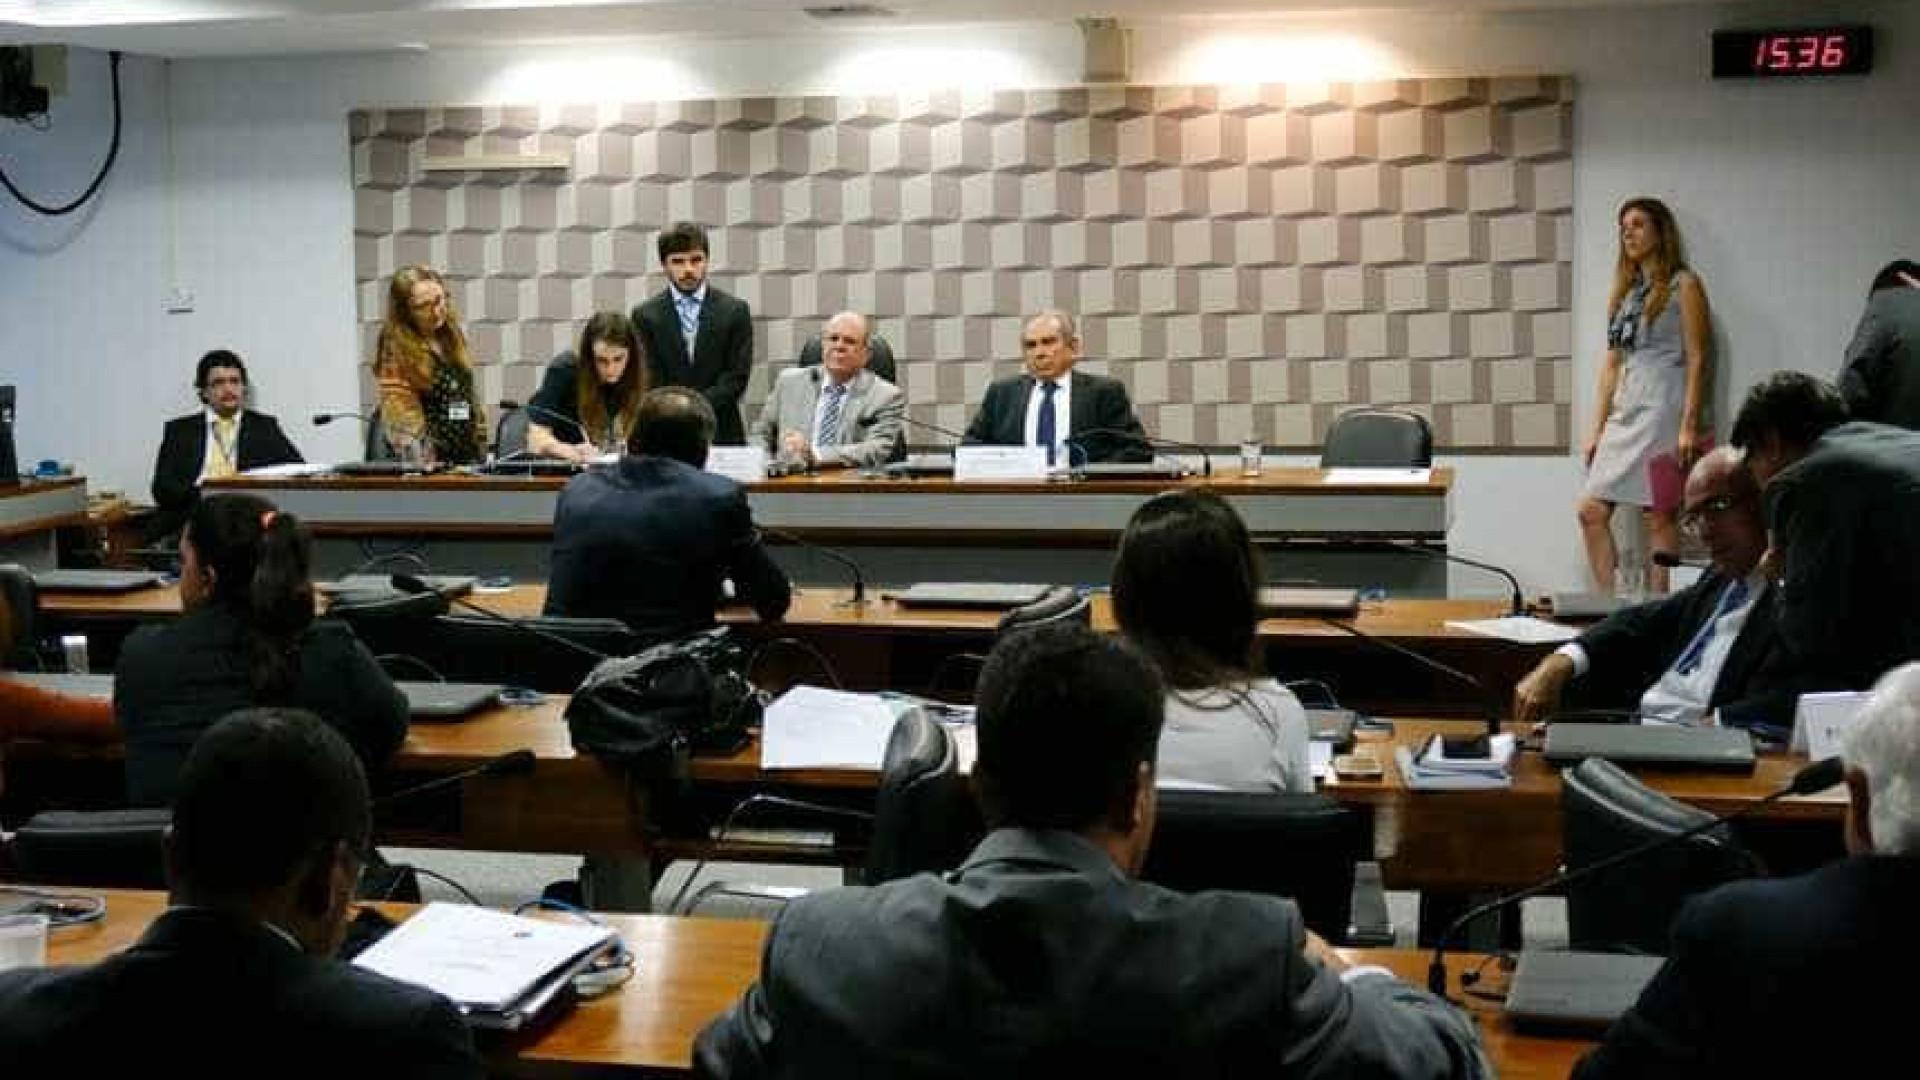 Dívida previdenciária de estados e municípios será debatida hoje